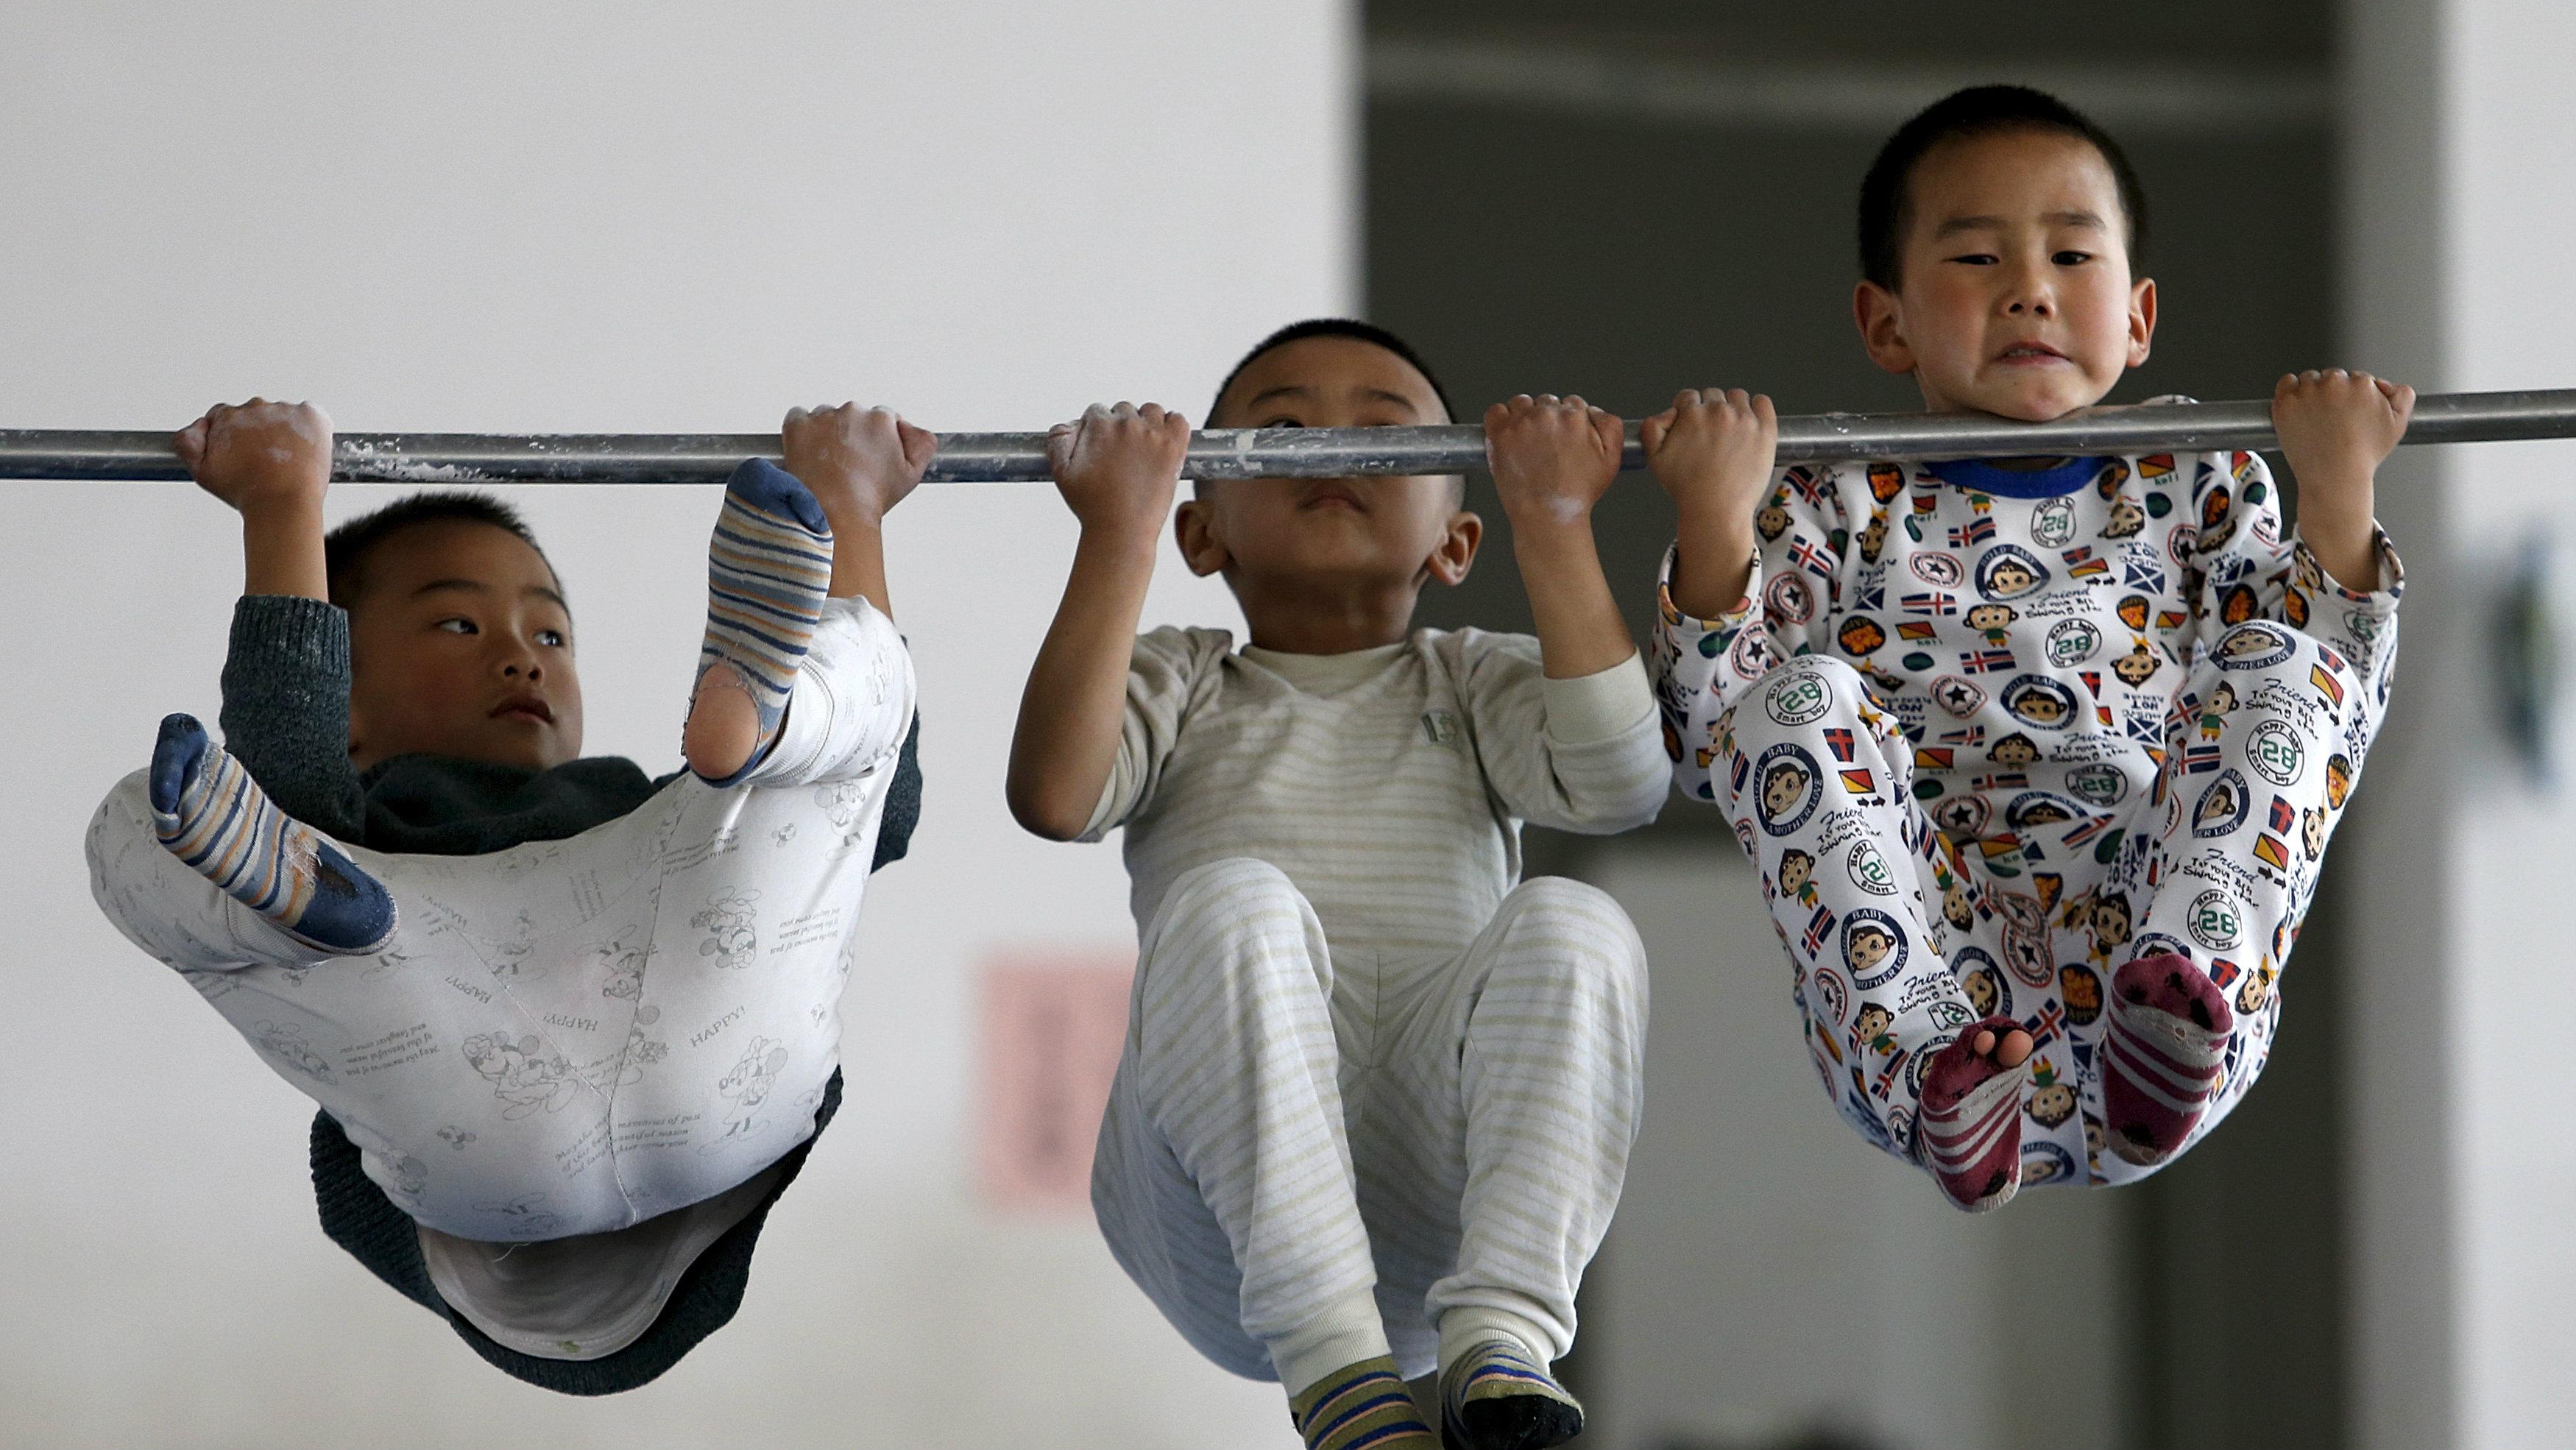 children doing pullups